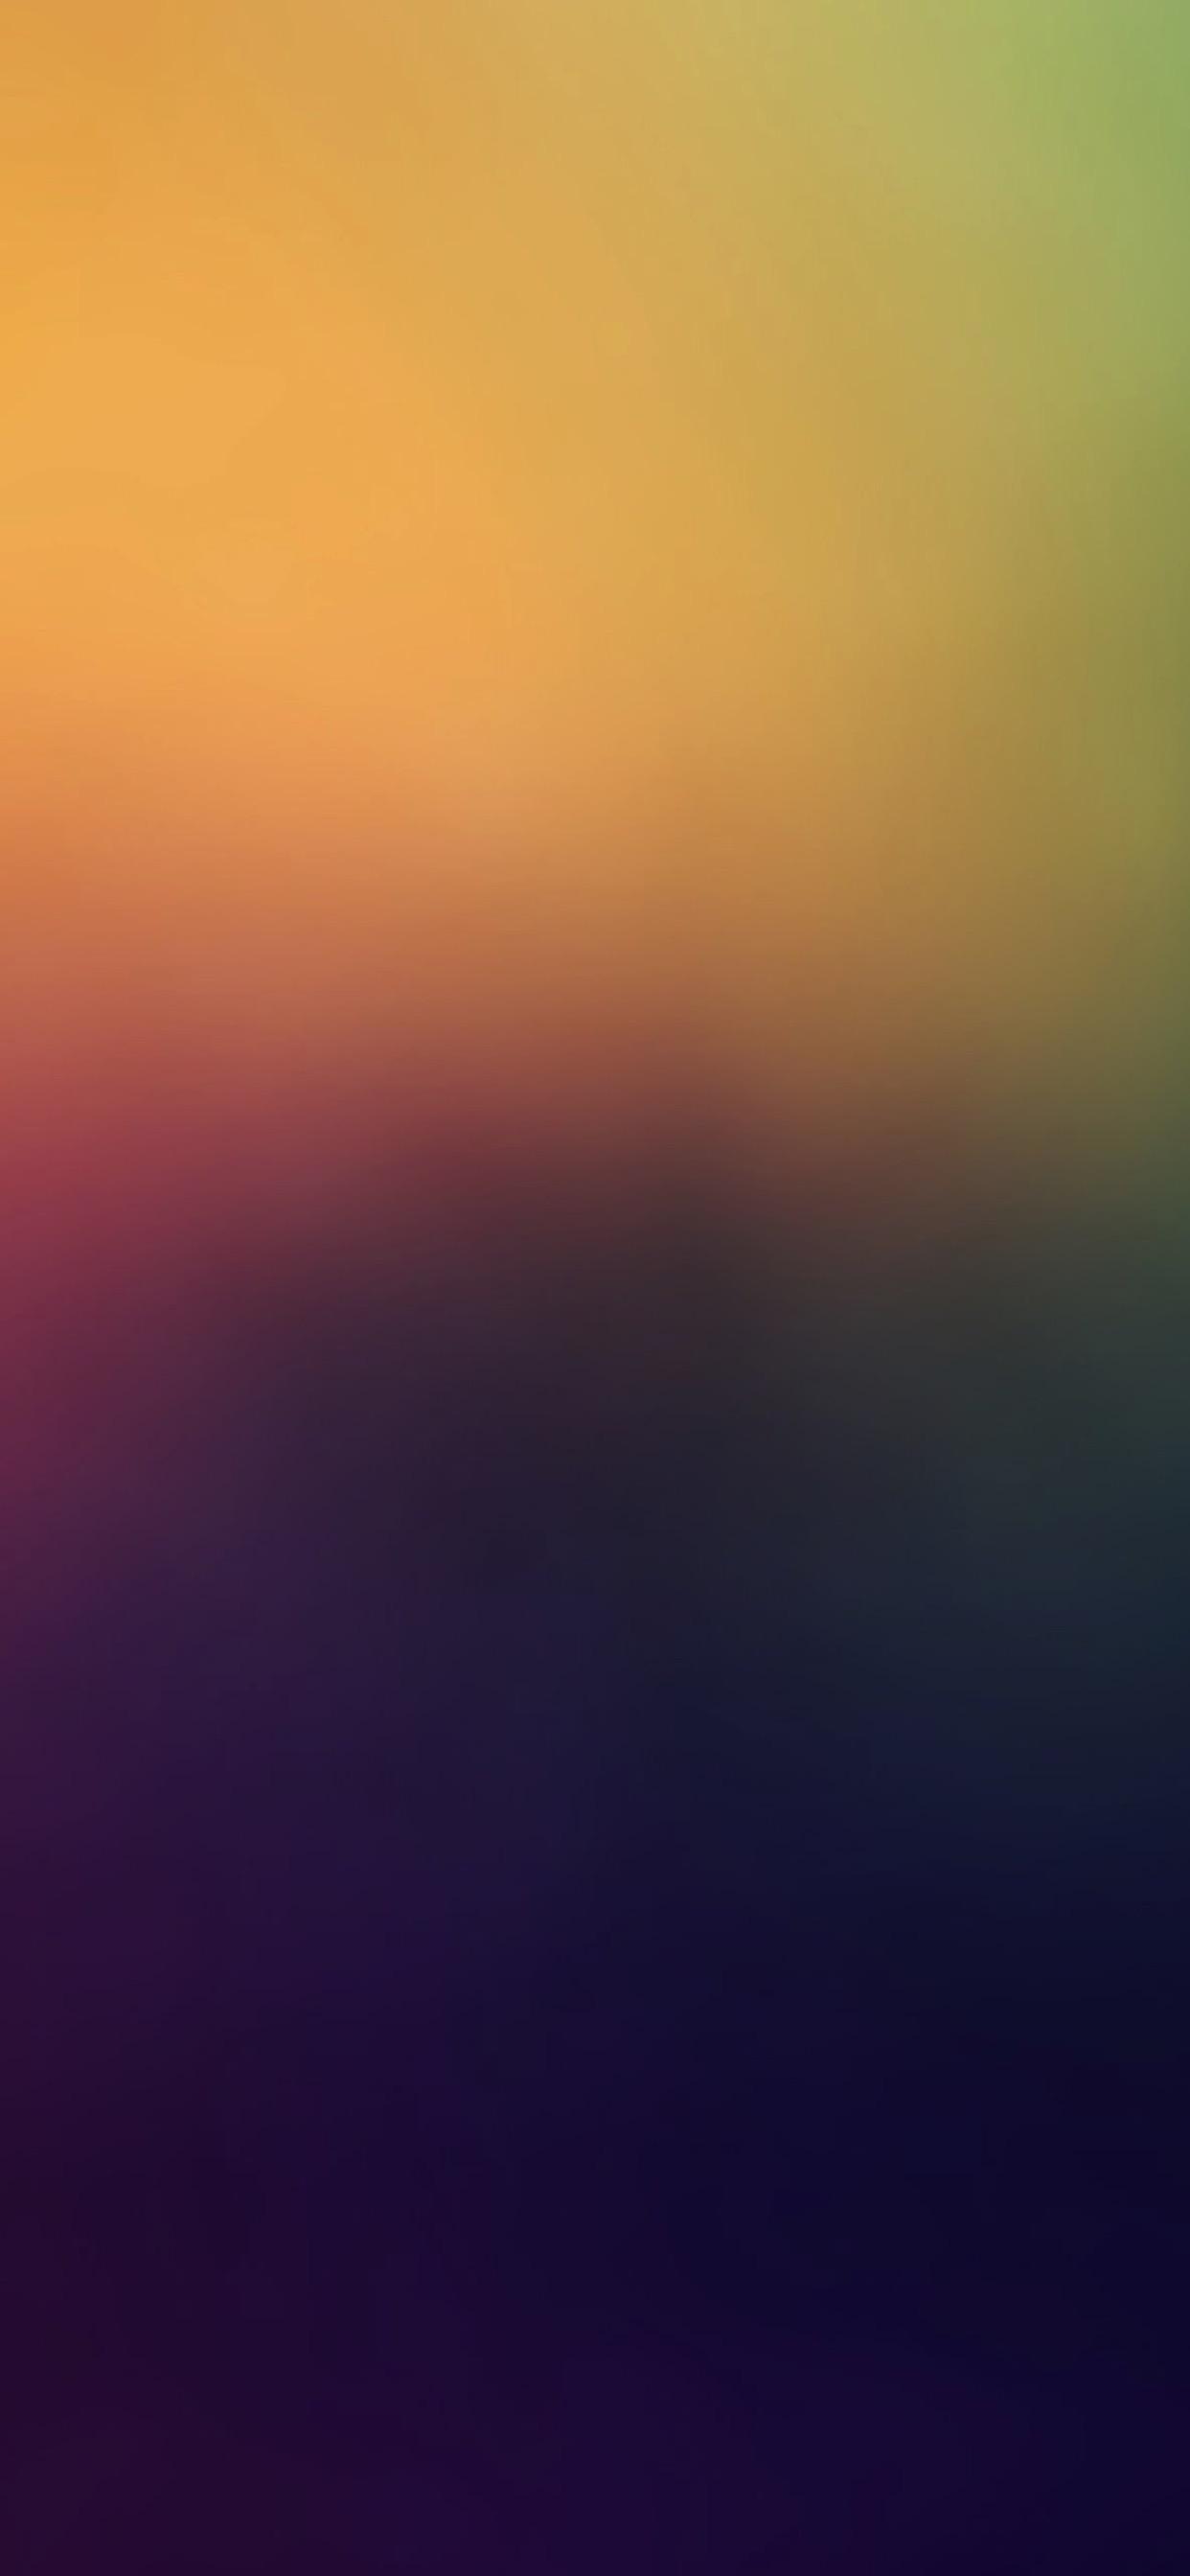 iPhone XS Max 壁紙 wallpaper 0404